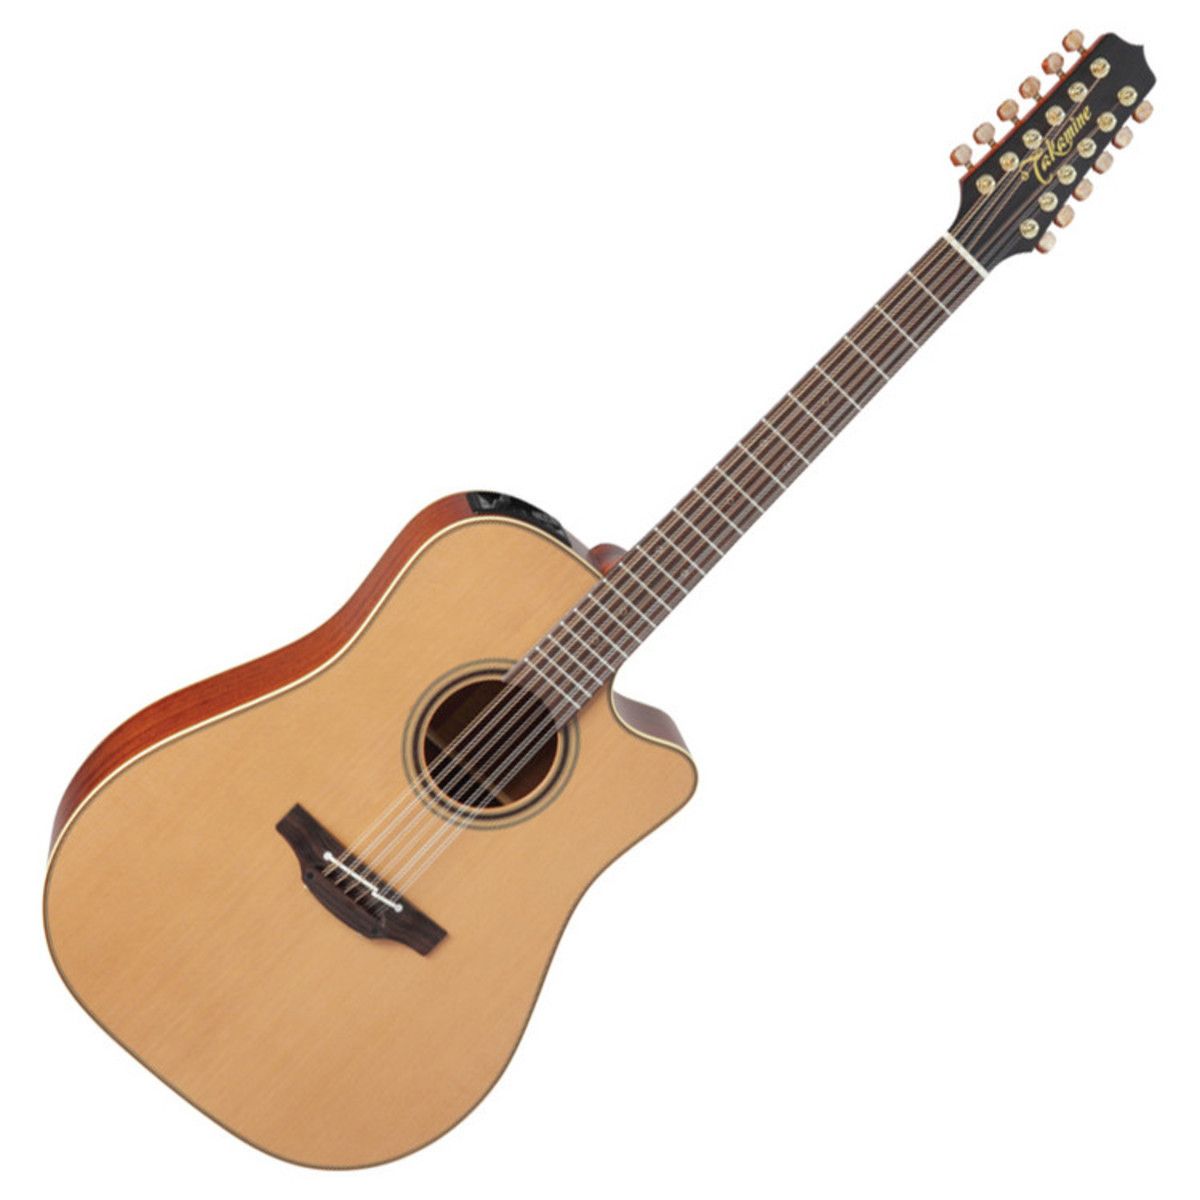 disc takamine p3dc 12 dread 12 string electro acoustic guitar at. Black Bedroom Furniture Sets. Home Design Ideas